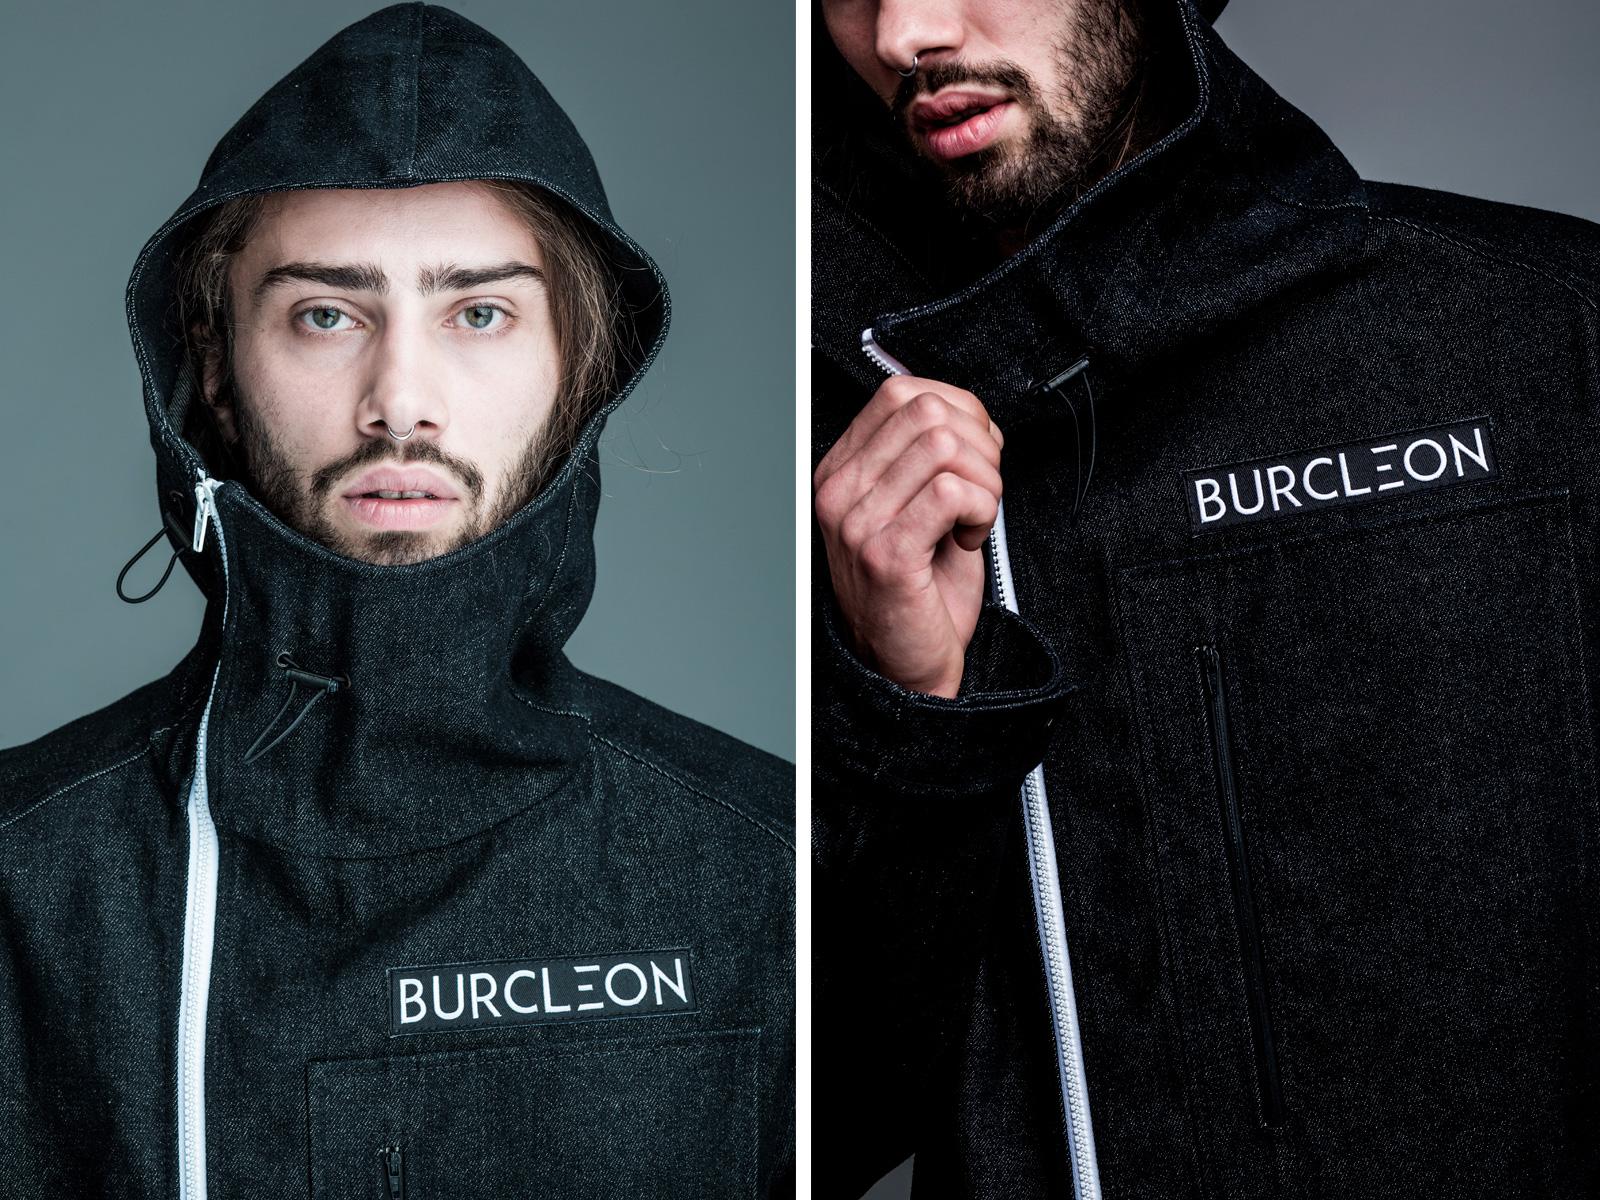 burcleon_mantel_07